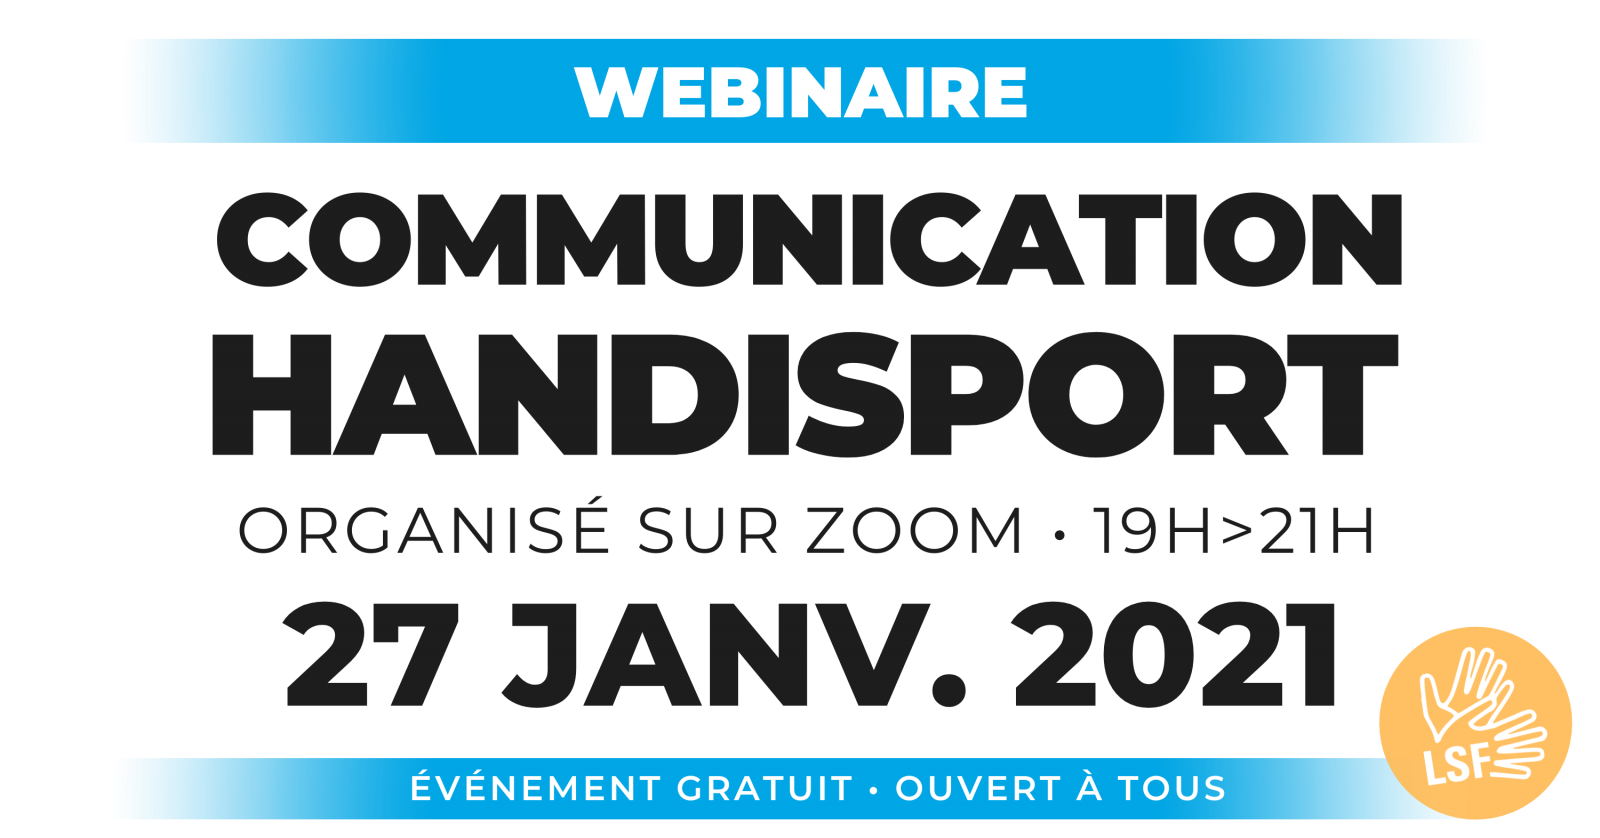 CONFERENCE / Webinaire Handisport COMMUNICATION @ Organisée via ZOOM